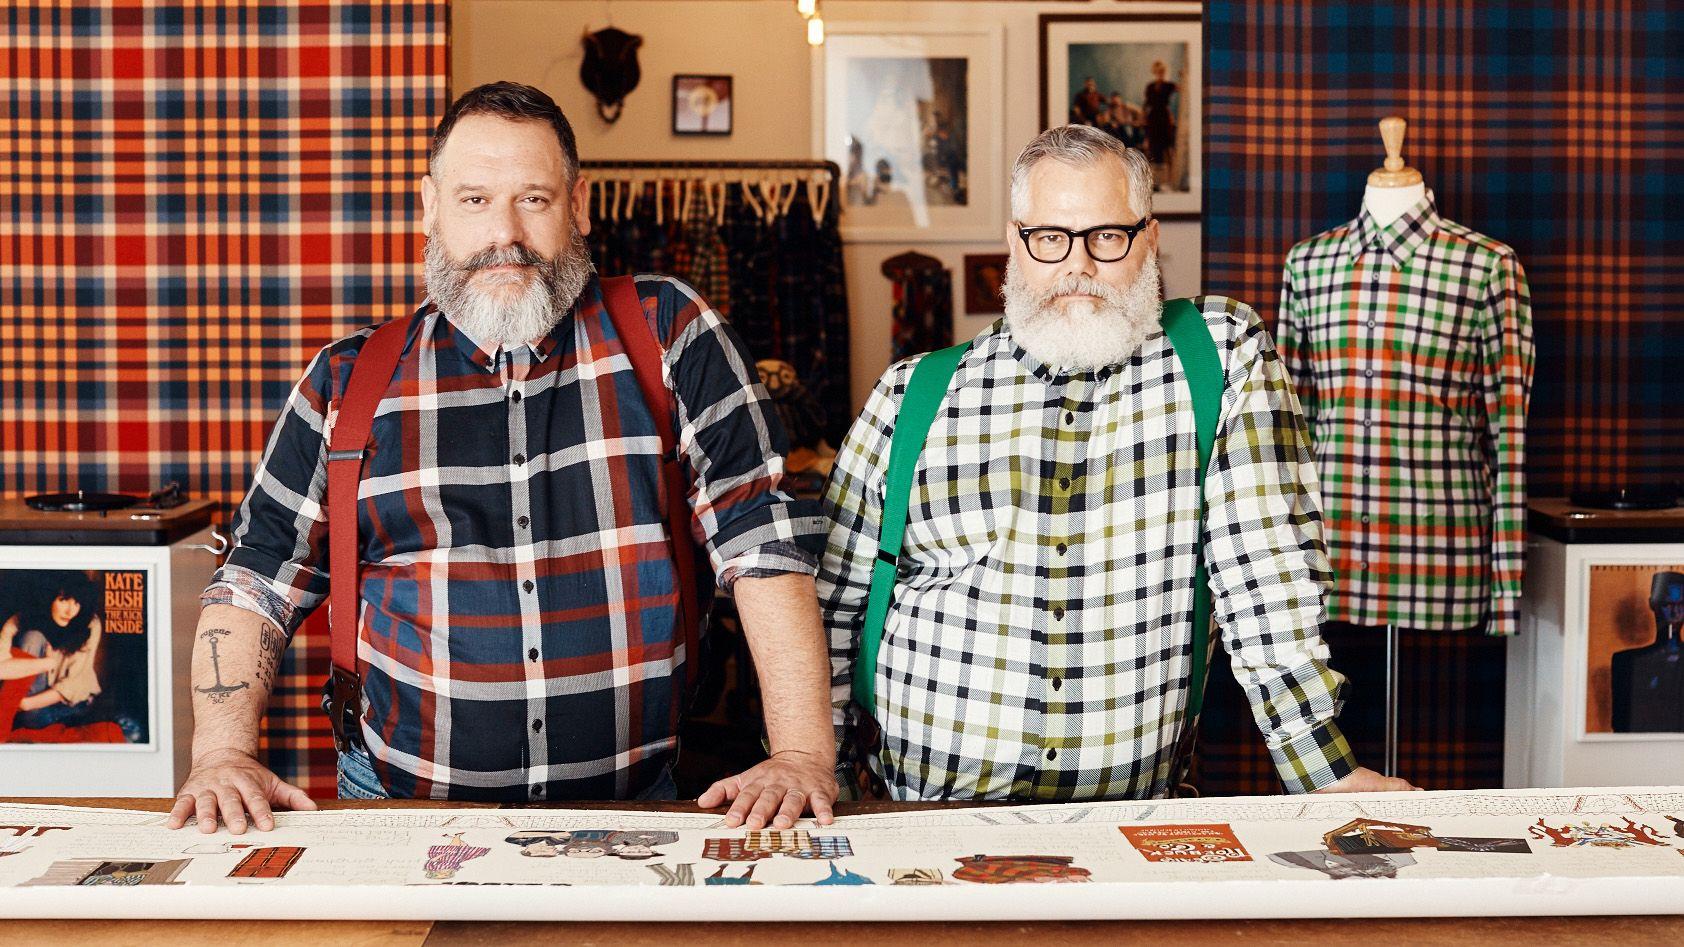 Meet the Twinning Lumberjacks of Fashion